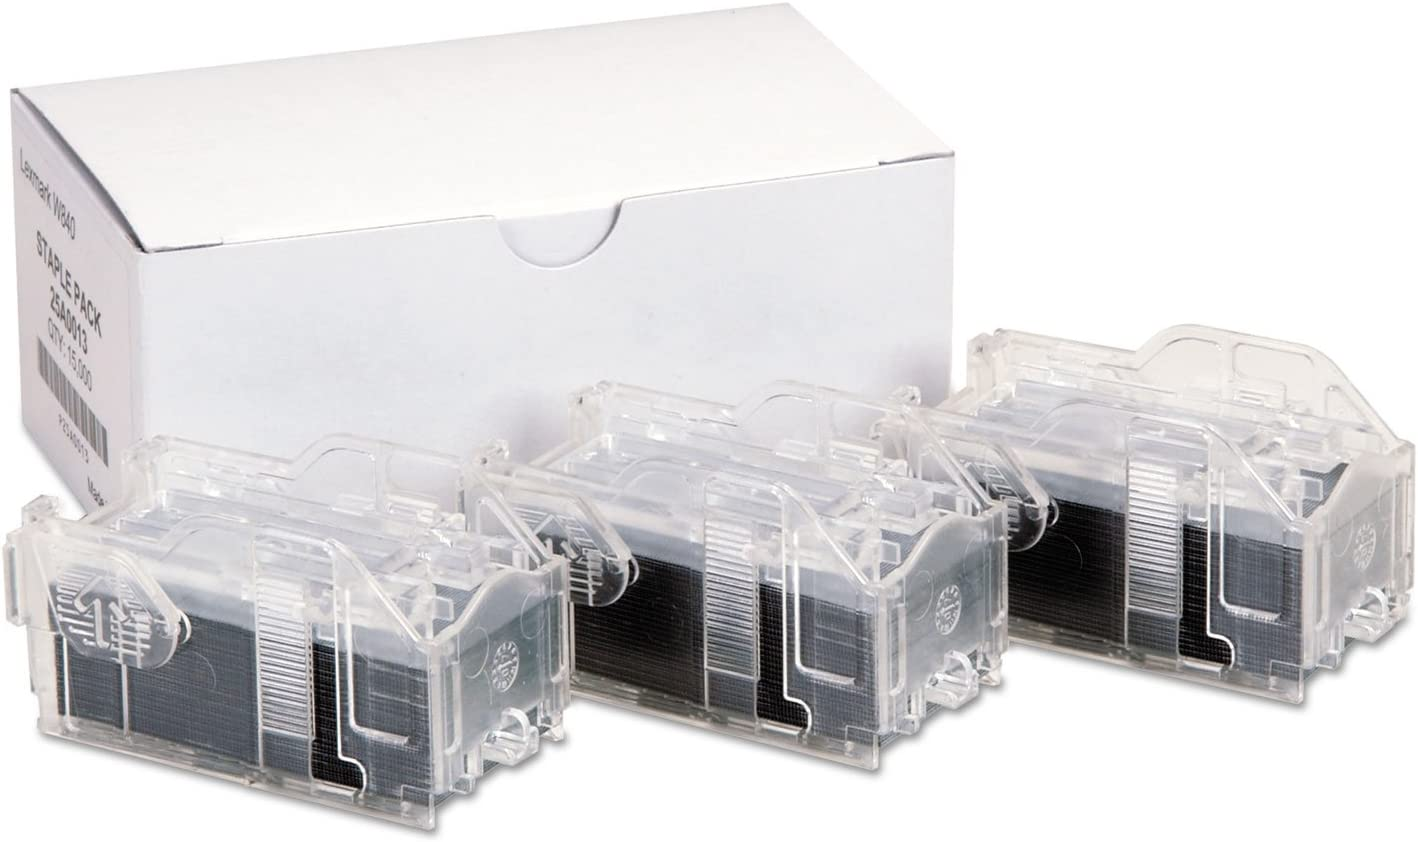 LEX25A0013 - Lexmark Standard Staples for Xerox X850/X852